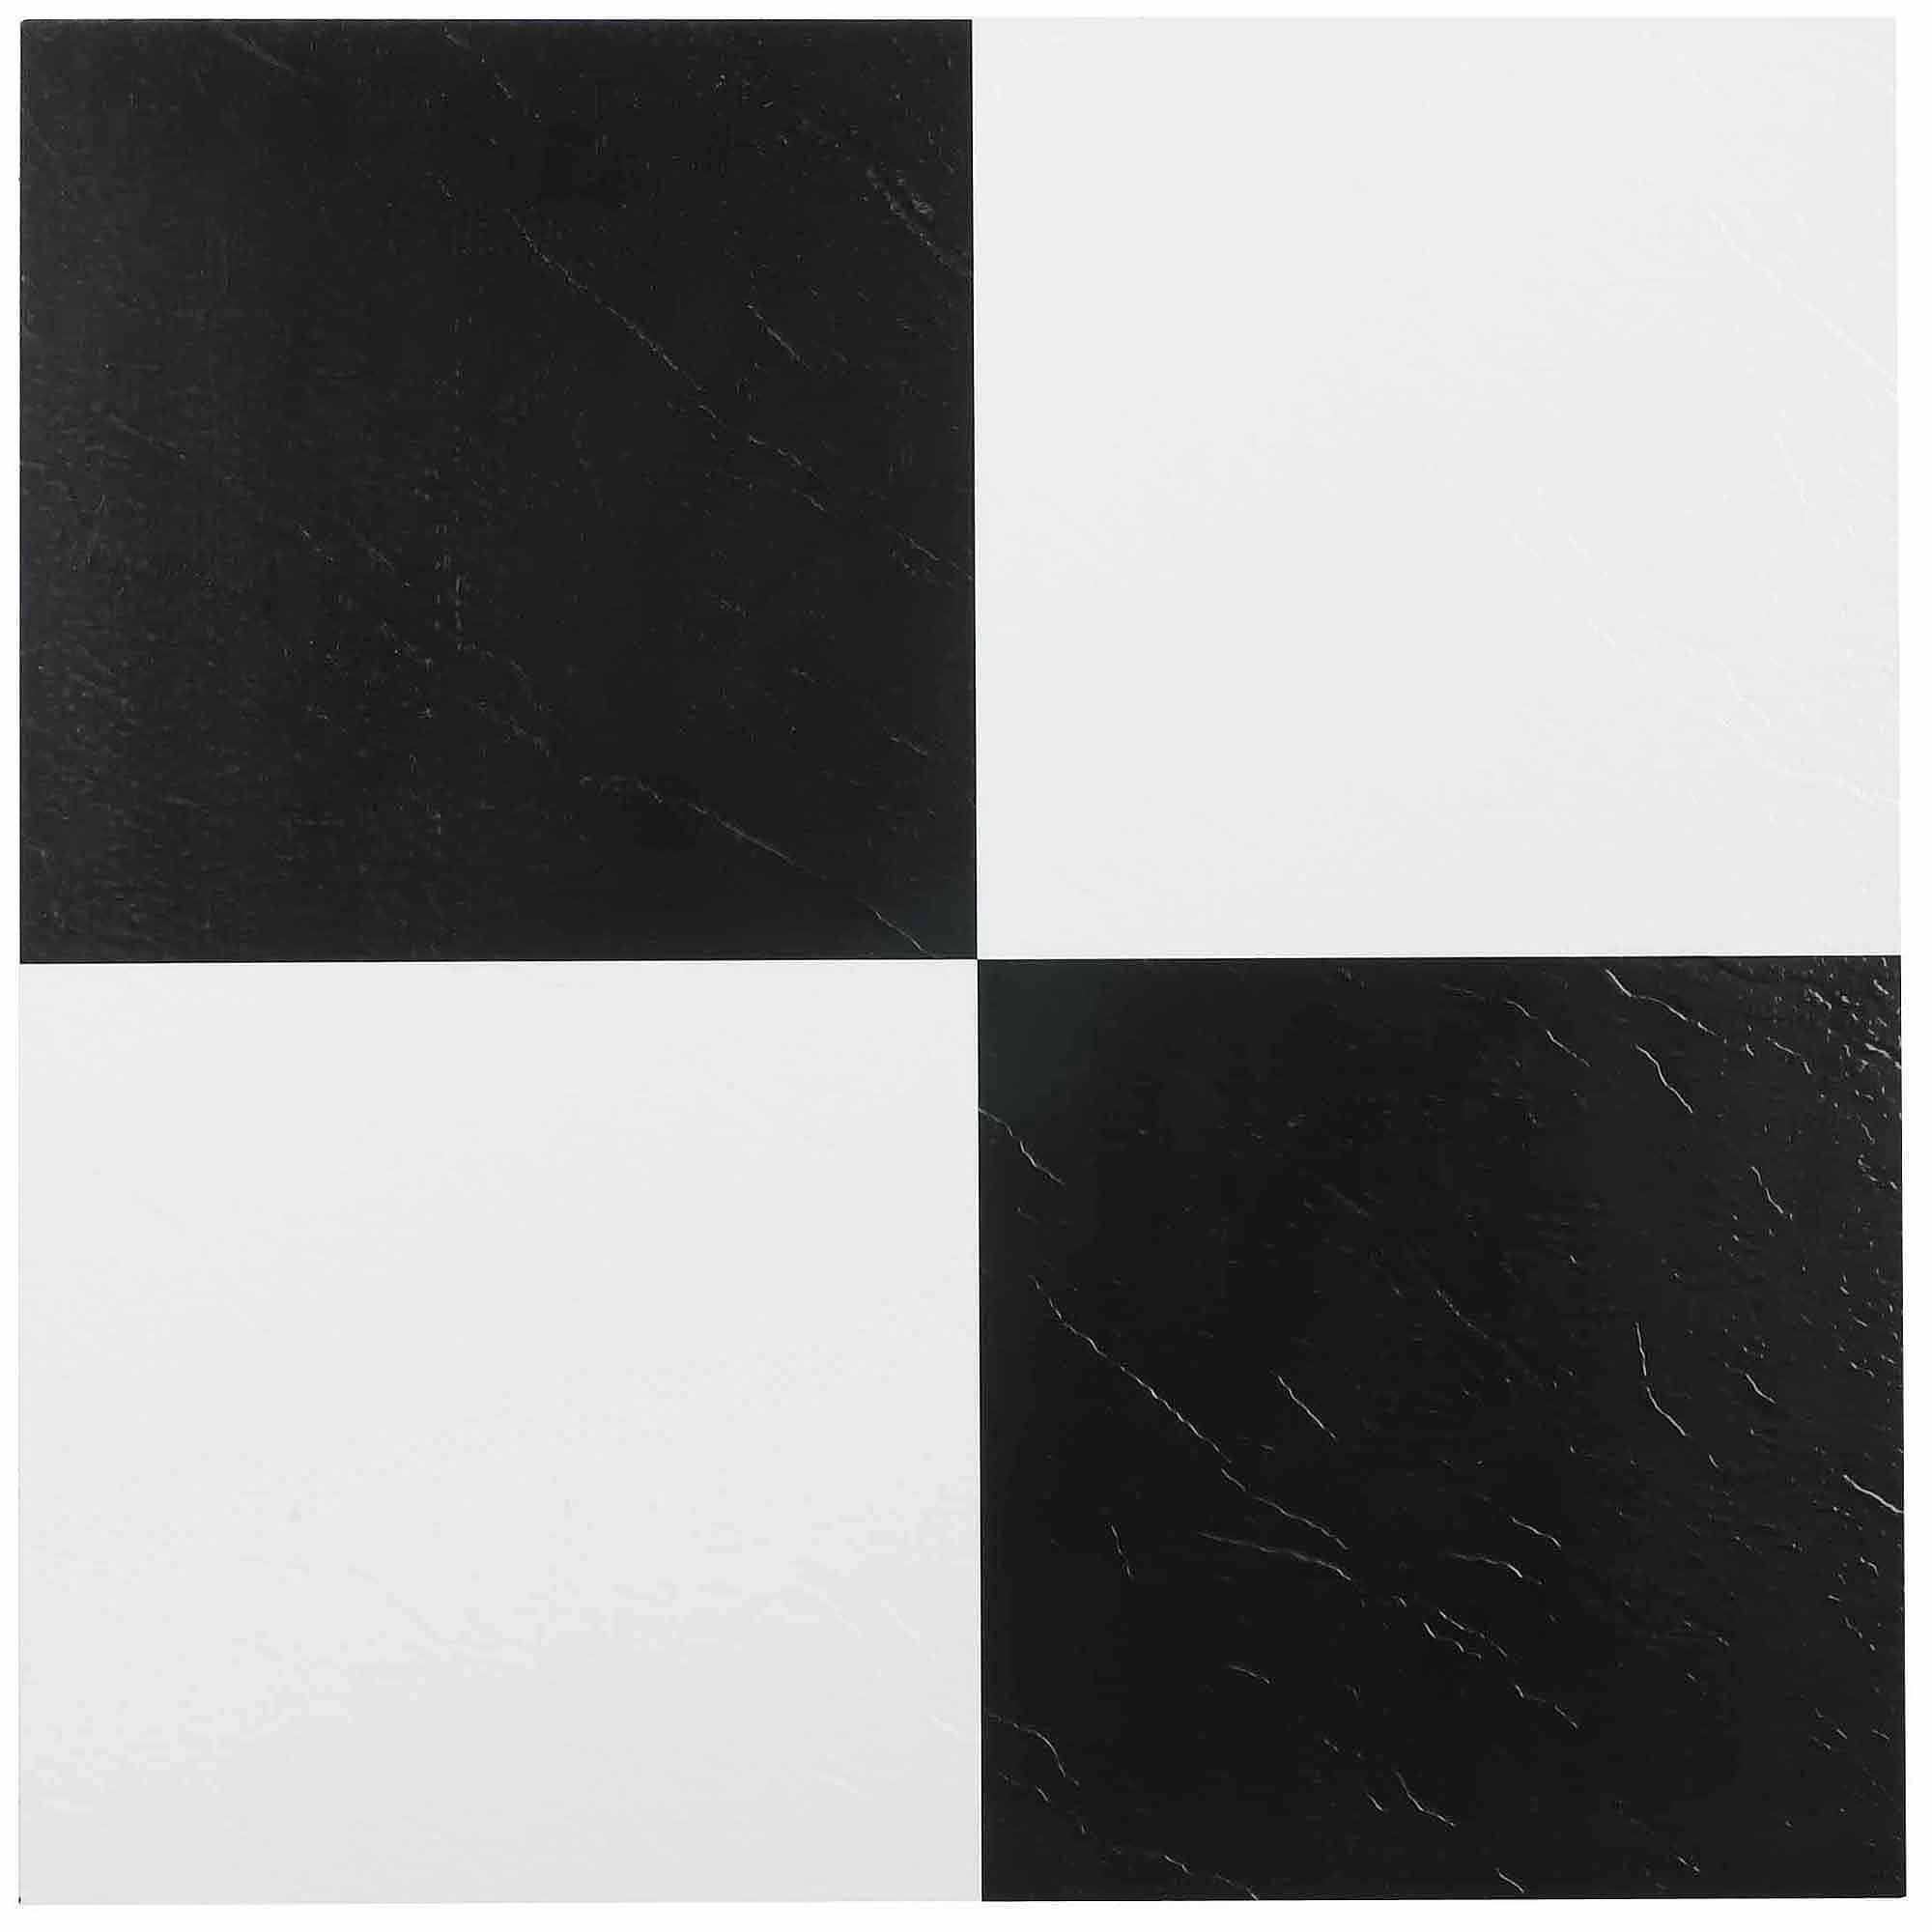 Black And White Self Adhesive Floor Tiles Httpnextsoft21